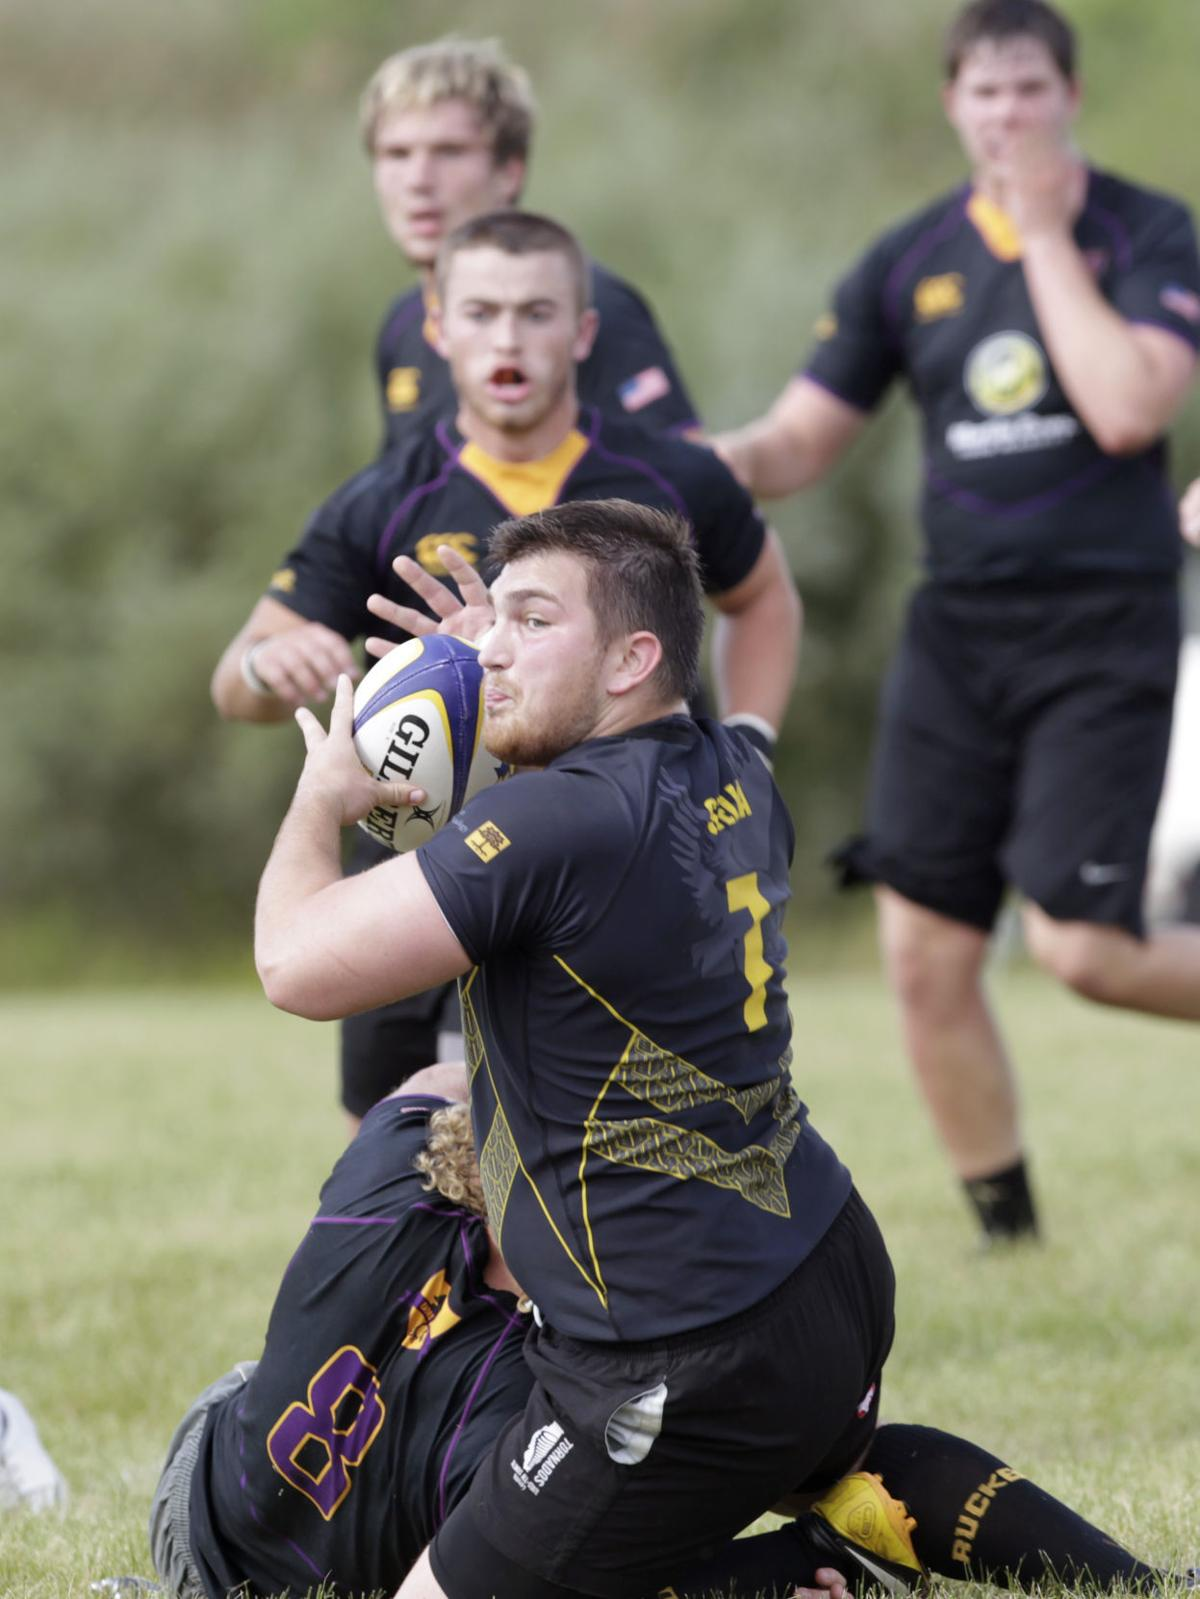 090316tsr-uni-iowa-rugby-scrimmage-06